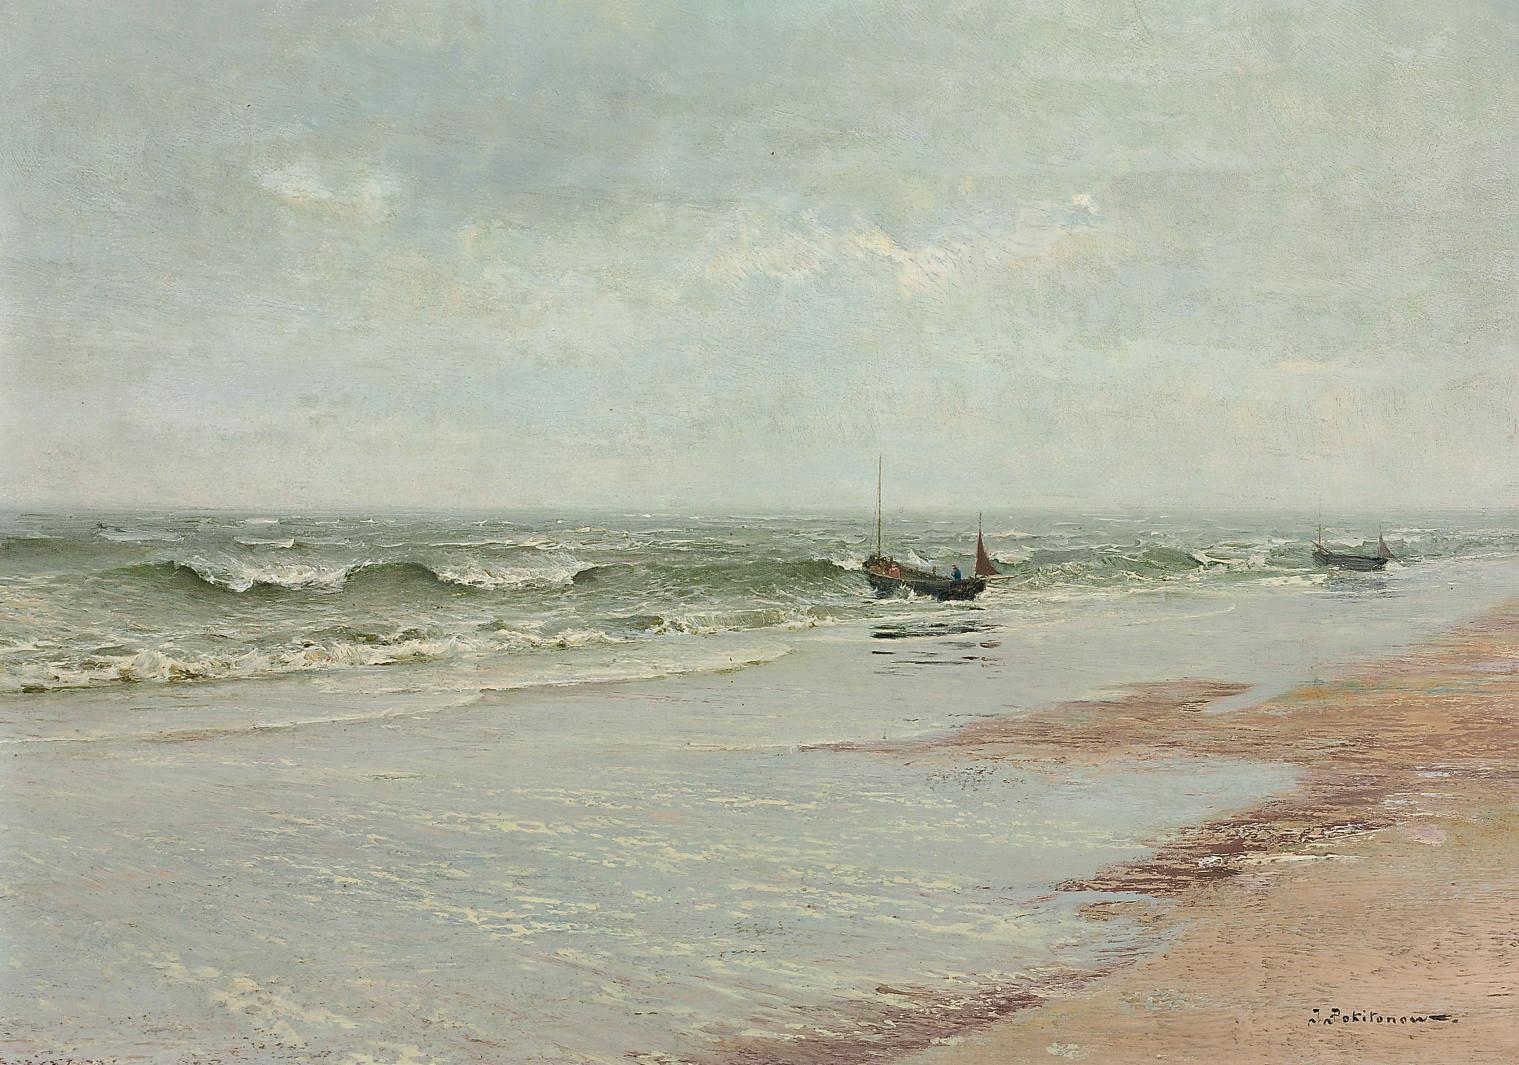 Bateaux de pêche prenant la mer